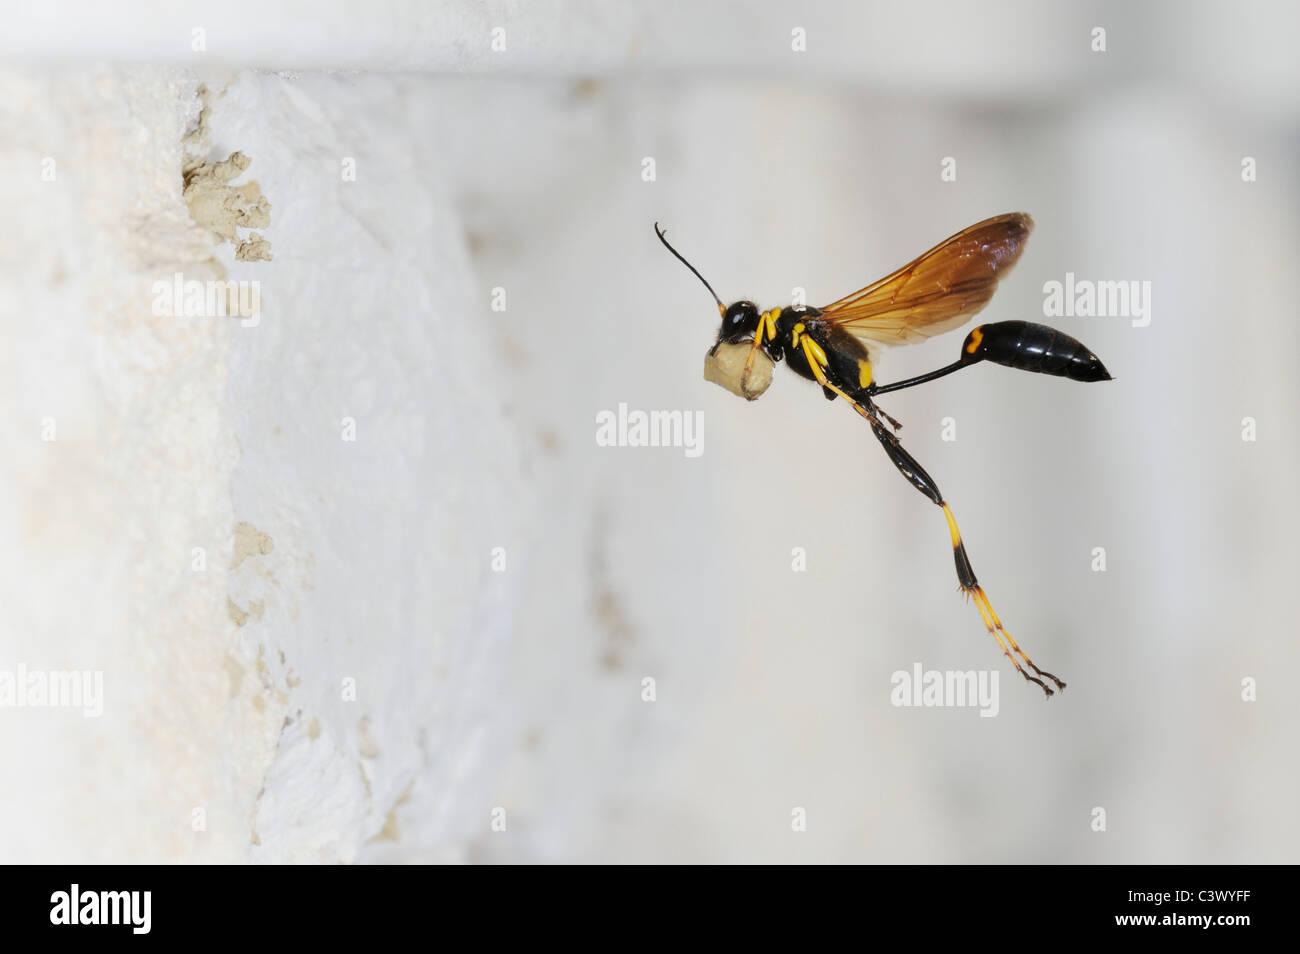 Black and yellow Mud Dauber (Sceliphron caementarium), female in flight bringing mud to nest inside wall, Comal - Stock Image